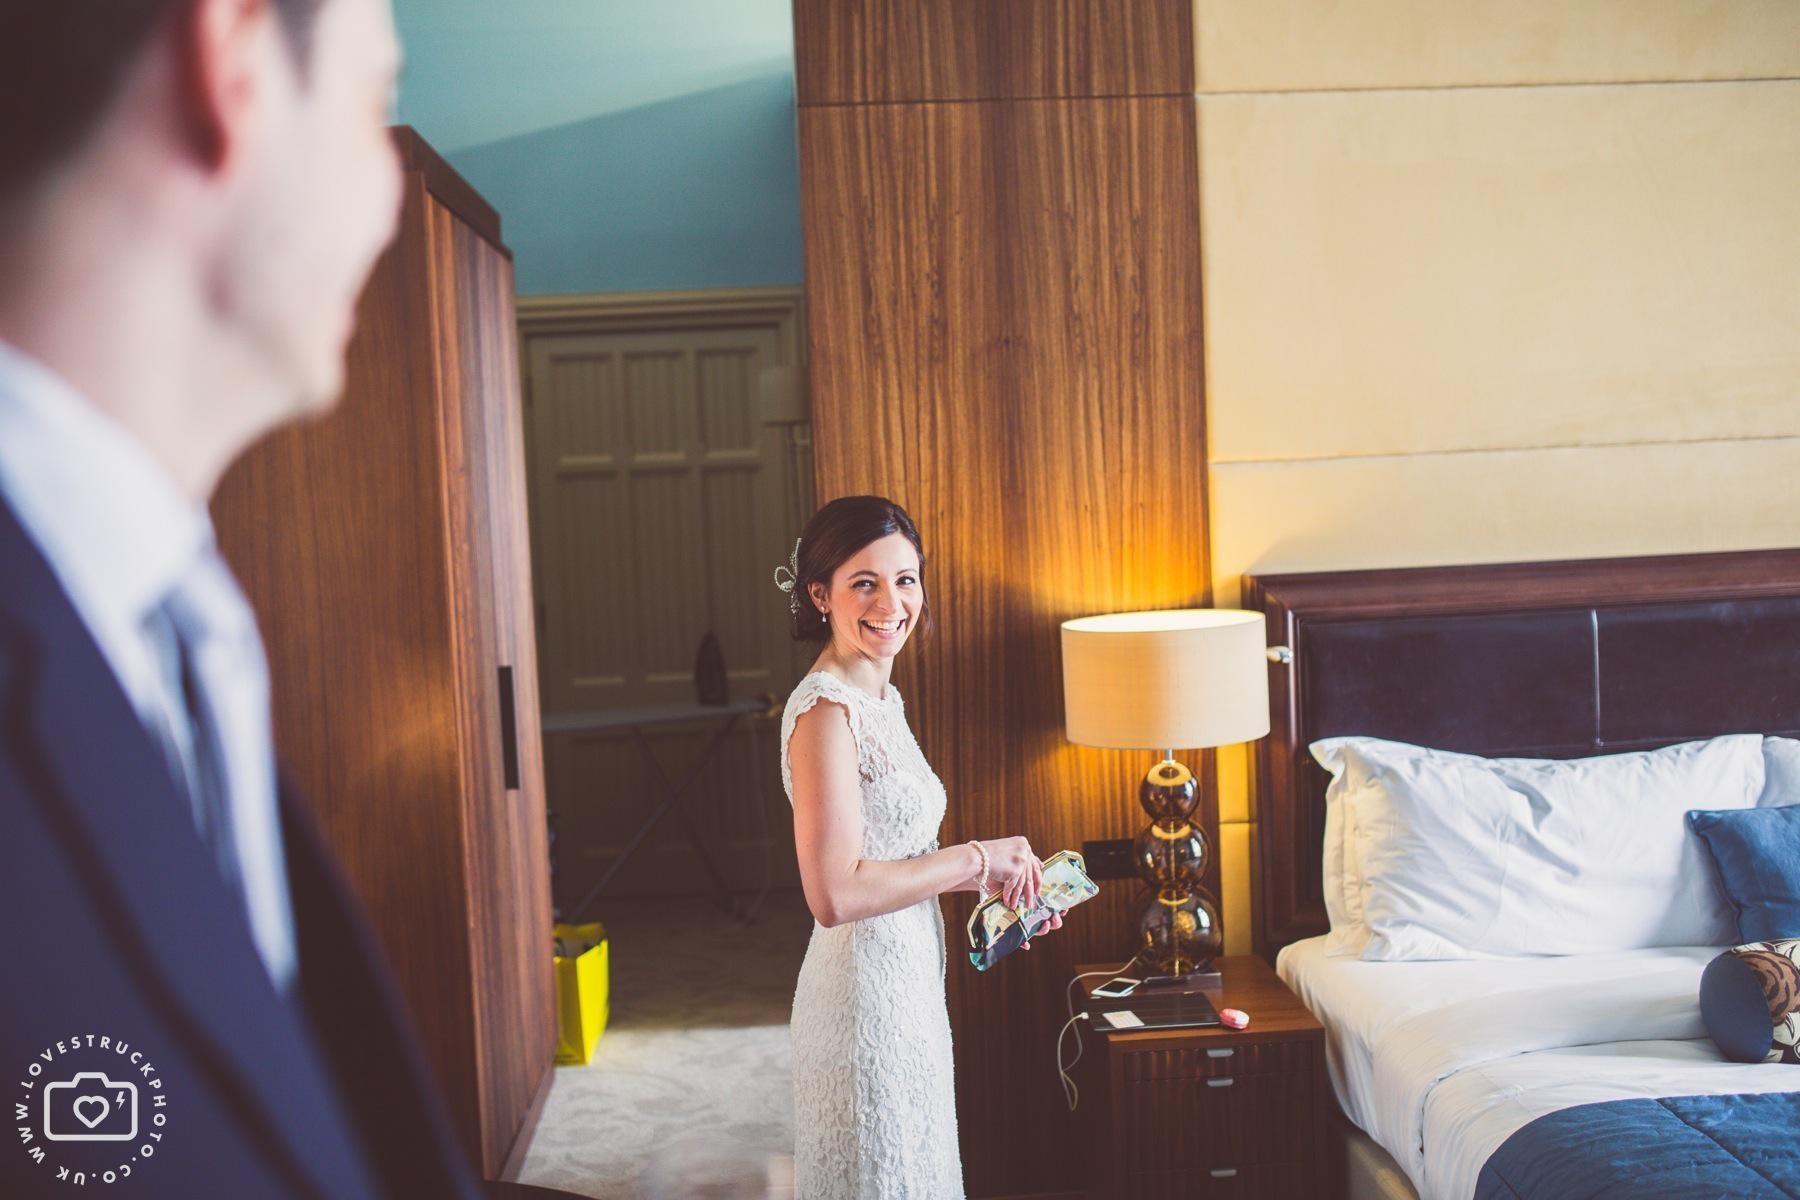 London St Pancras Renaissance Hotel Wedding, St Pancras Chambers Wedding